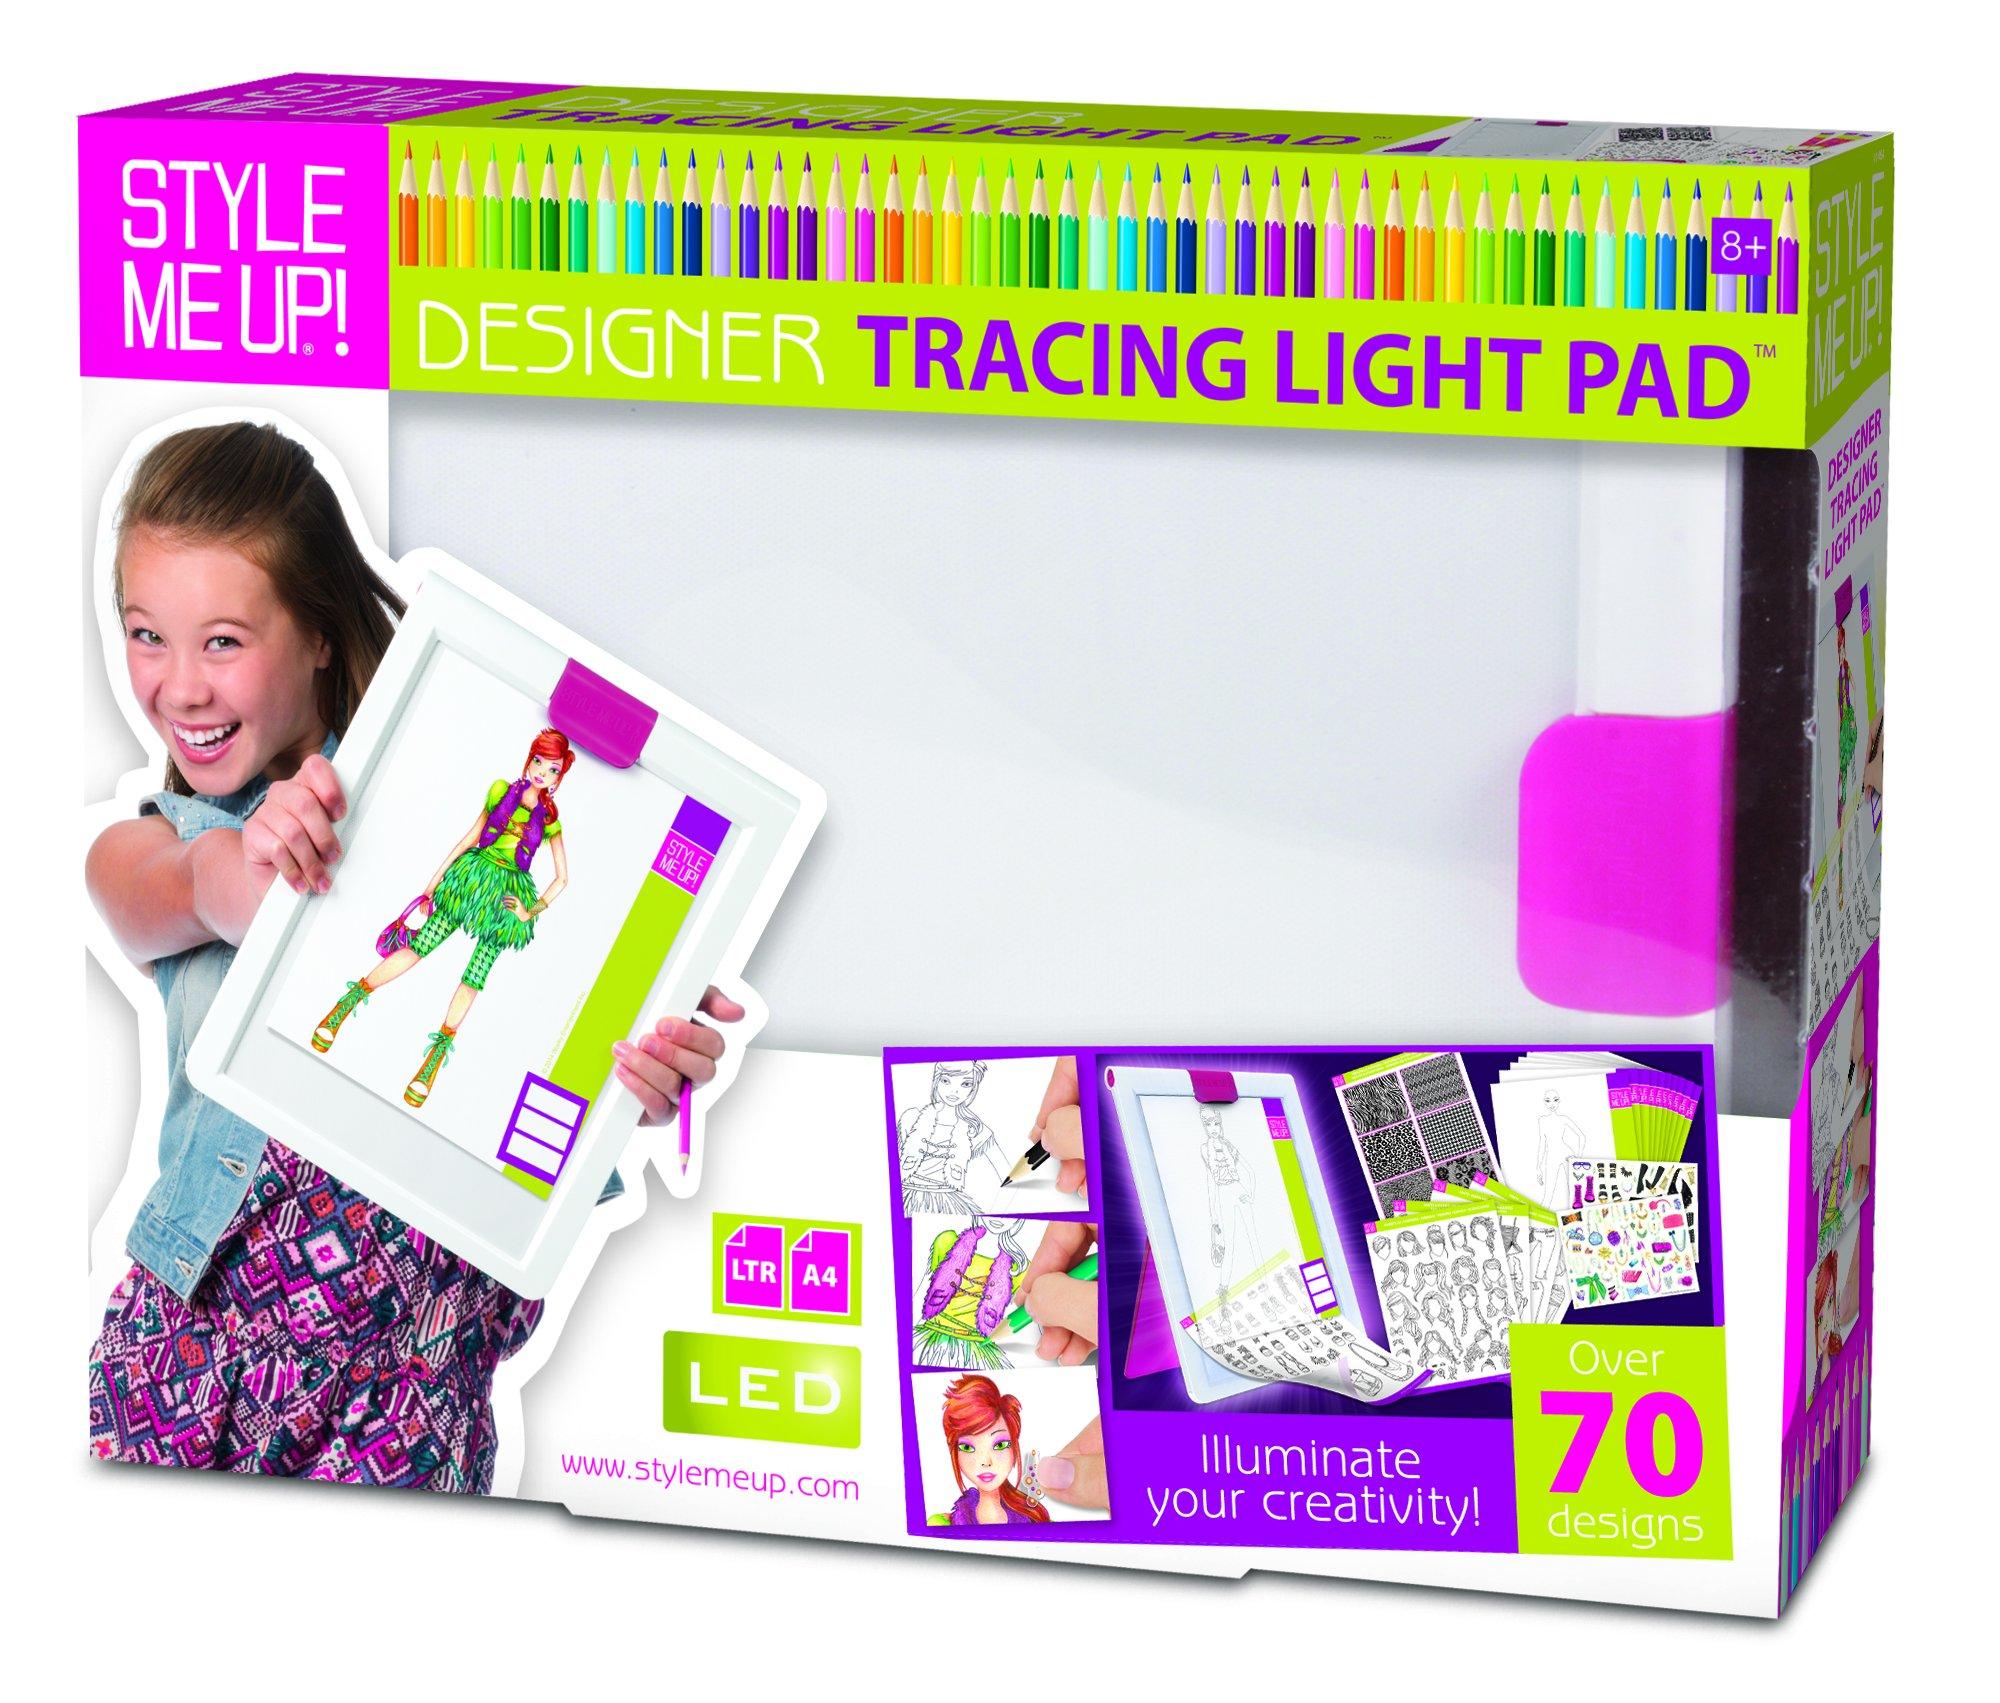 Style Me Up! Designer Tracing Light Pad